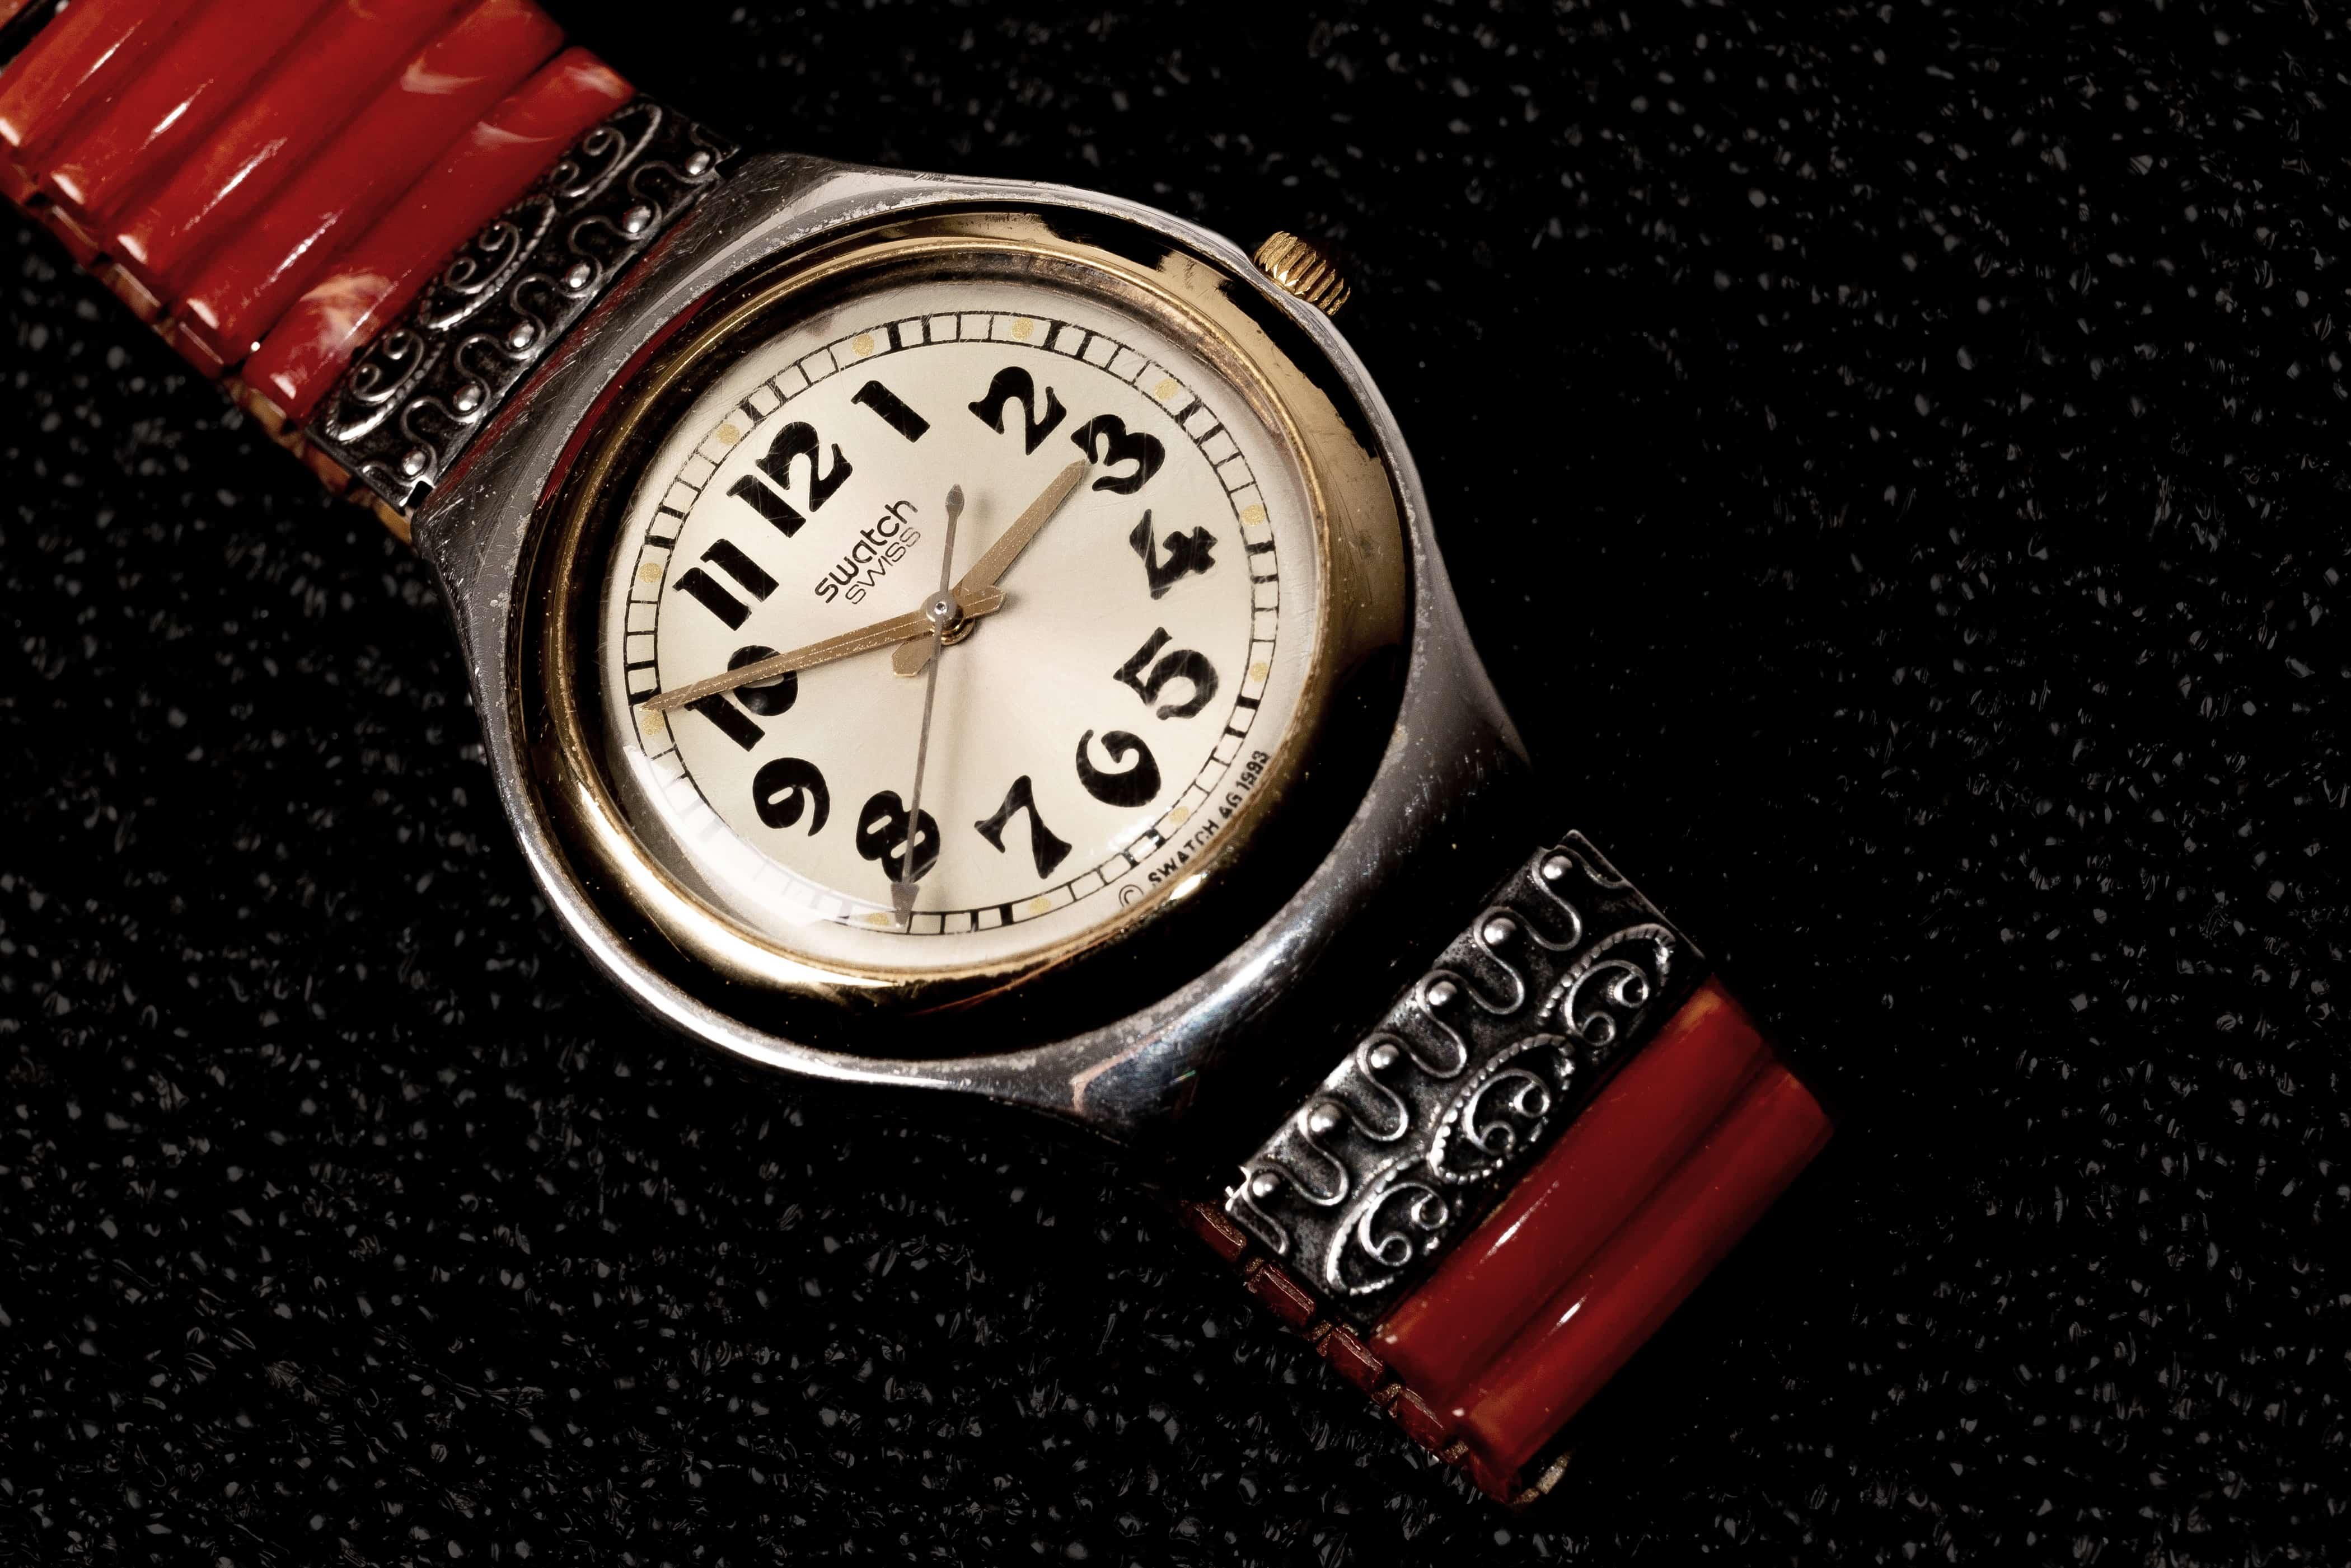 Swatch / Sigma 70 mm Macro